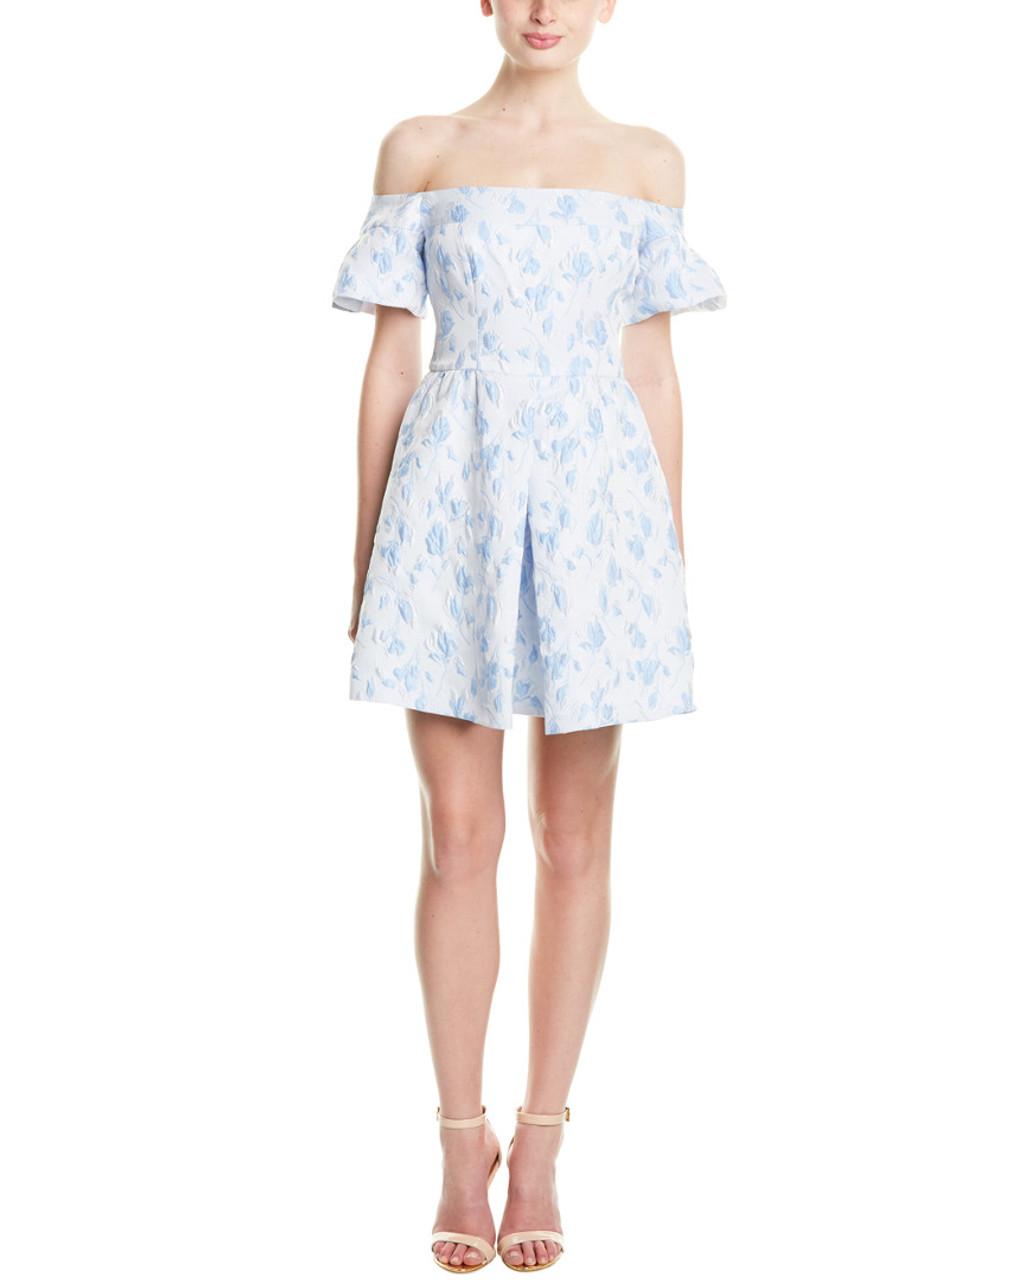 449f694c45 Cynthia Rowley A-Line Dress~1050943503 - Carsons